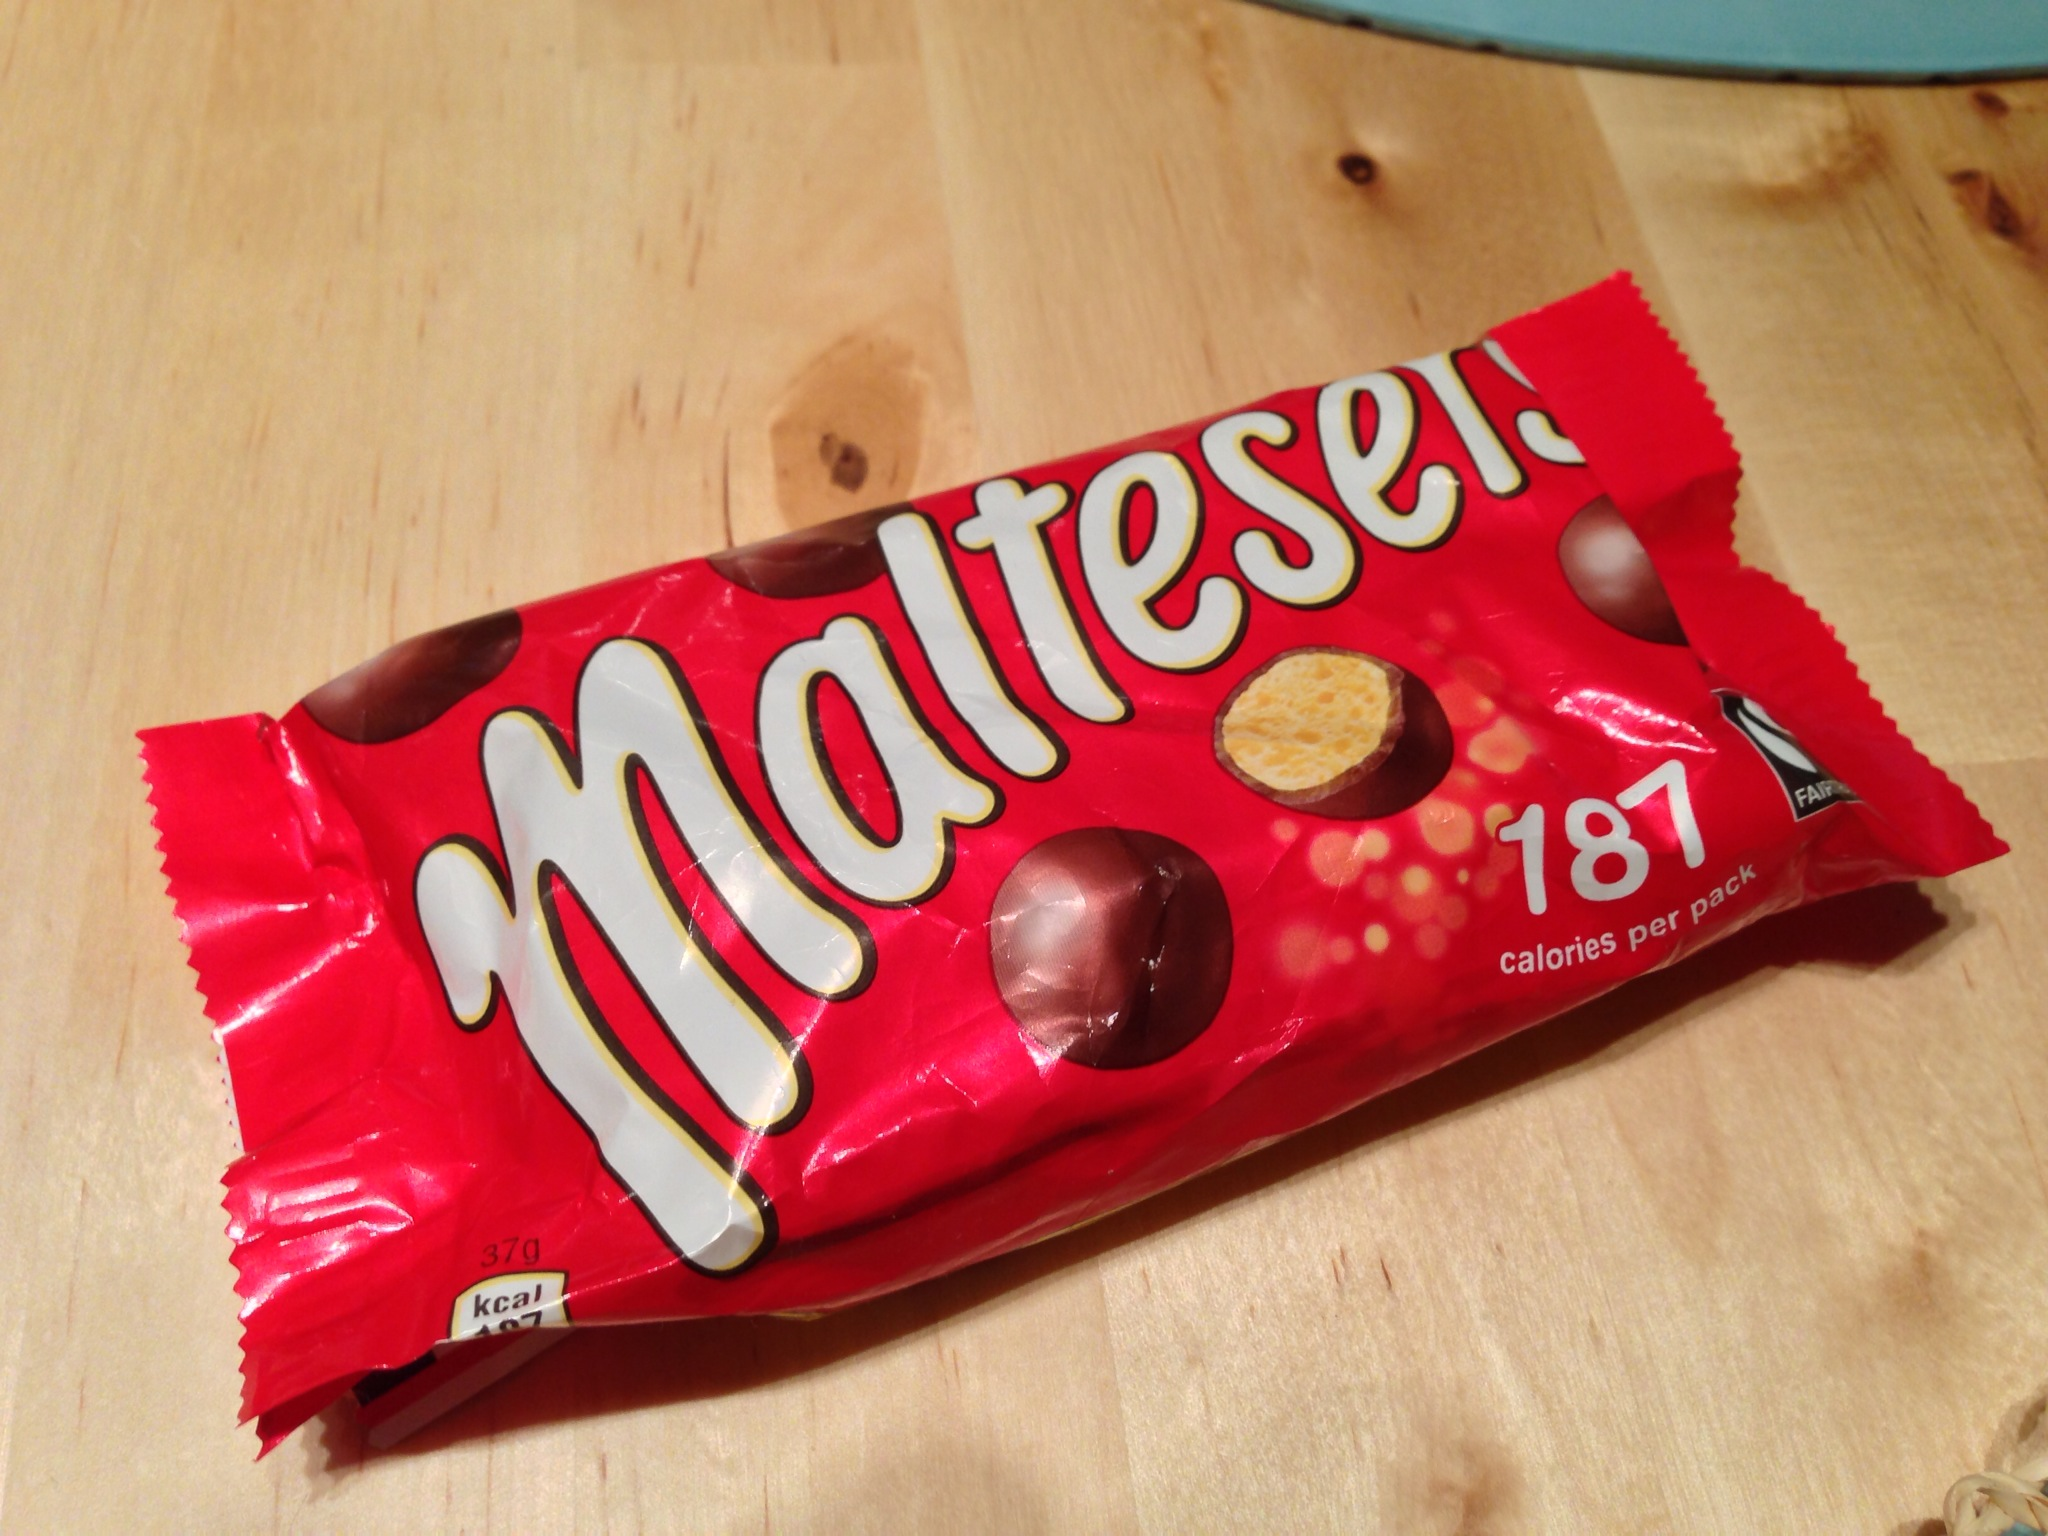 Maltesers!